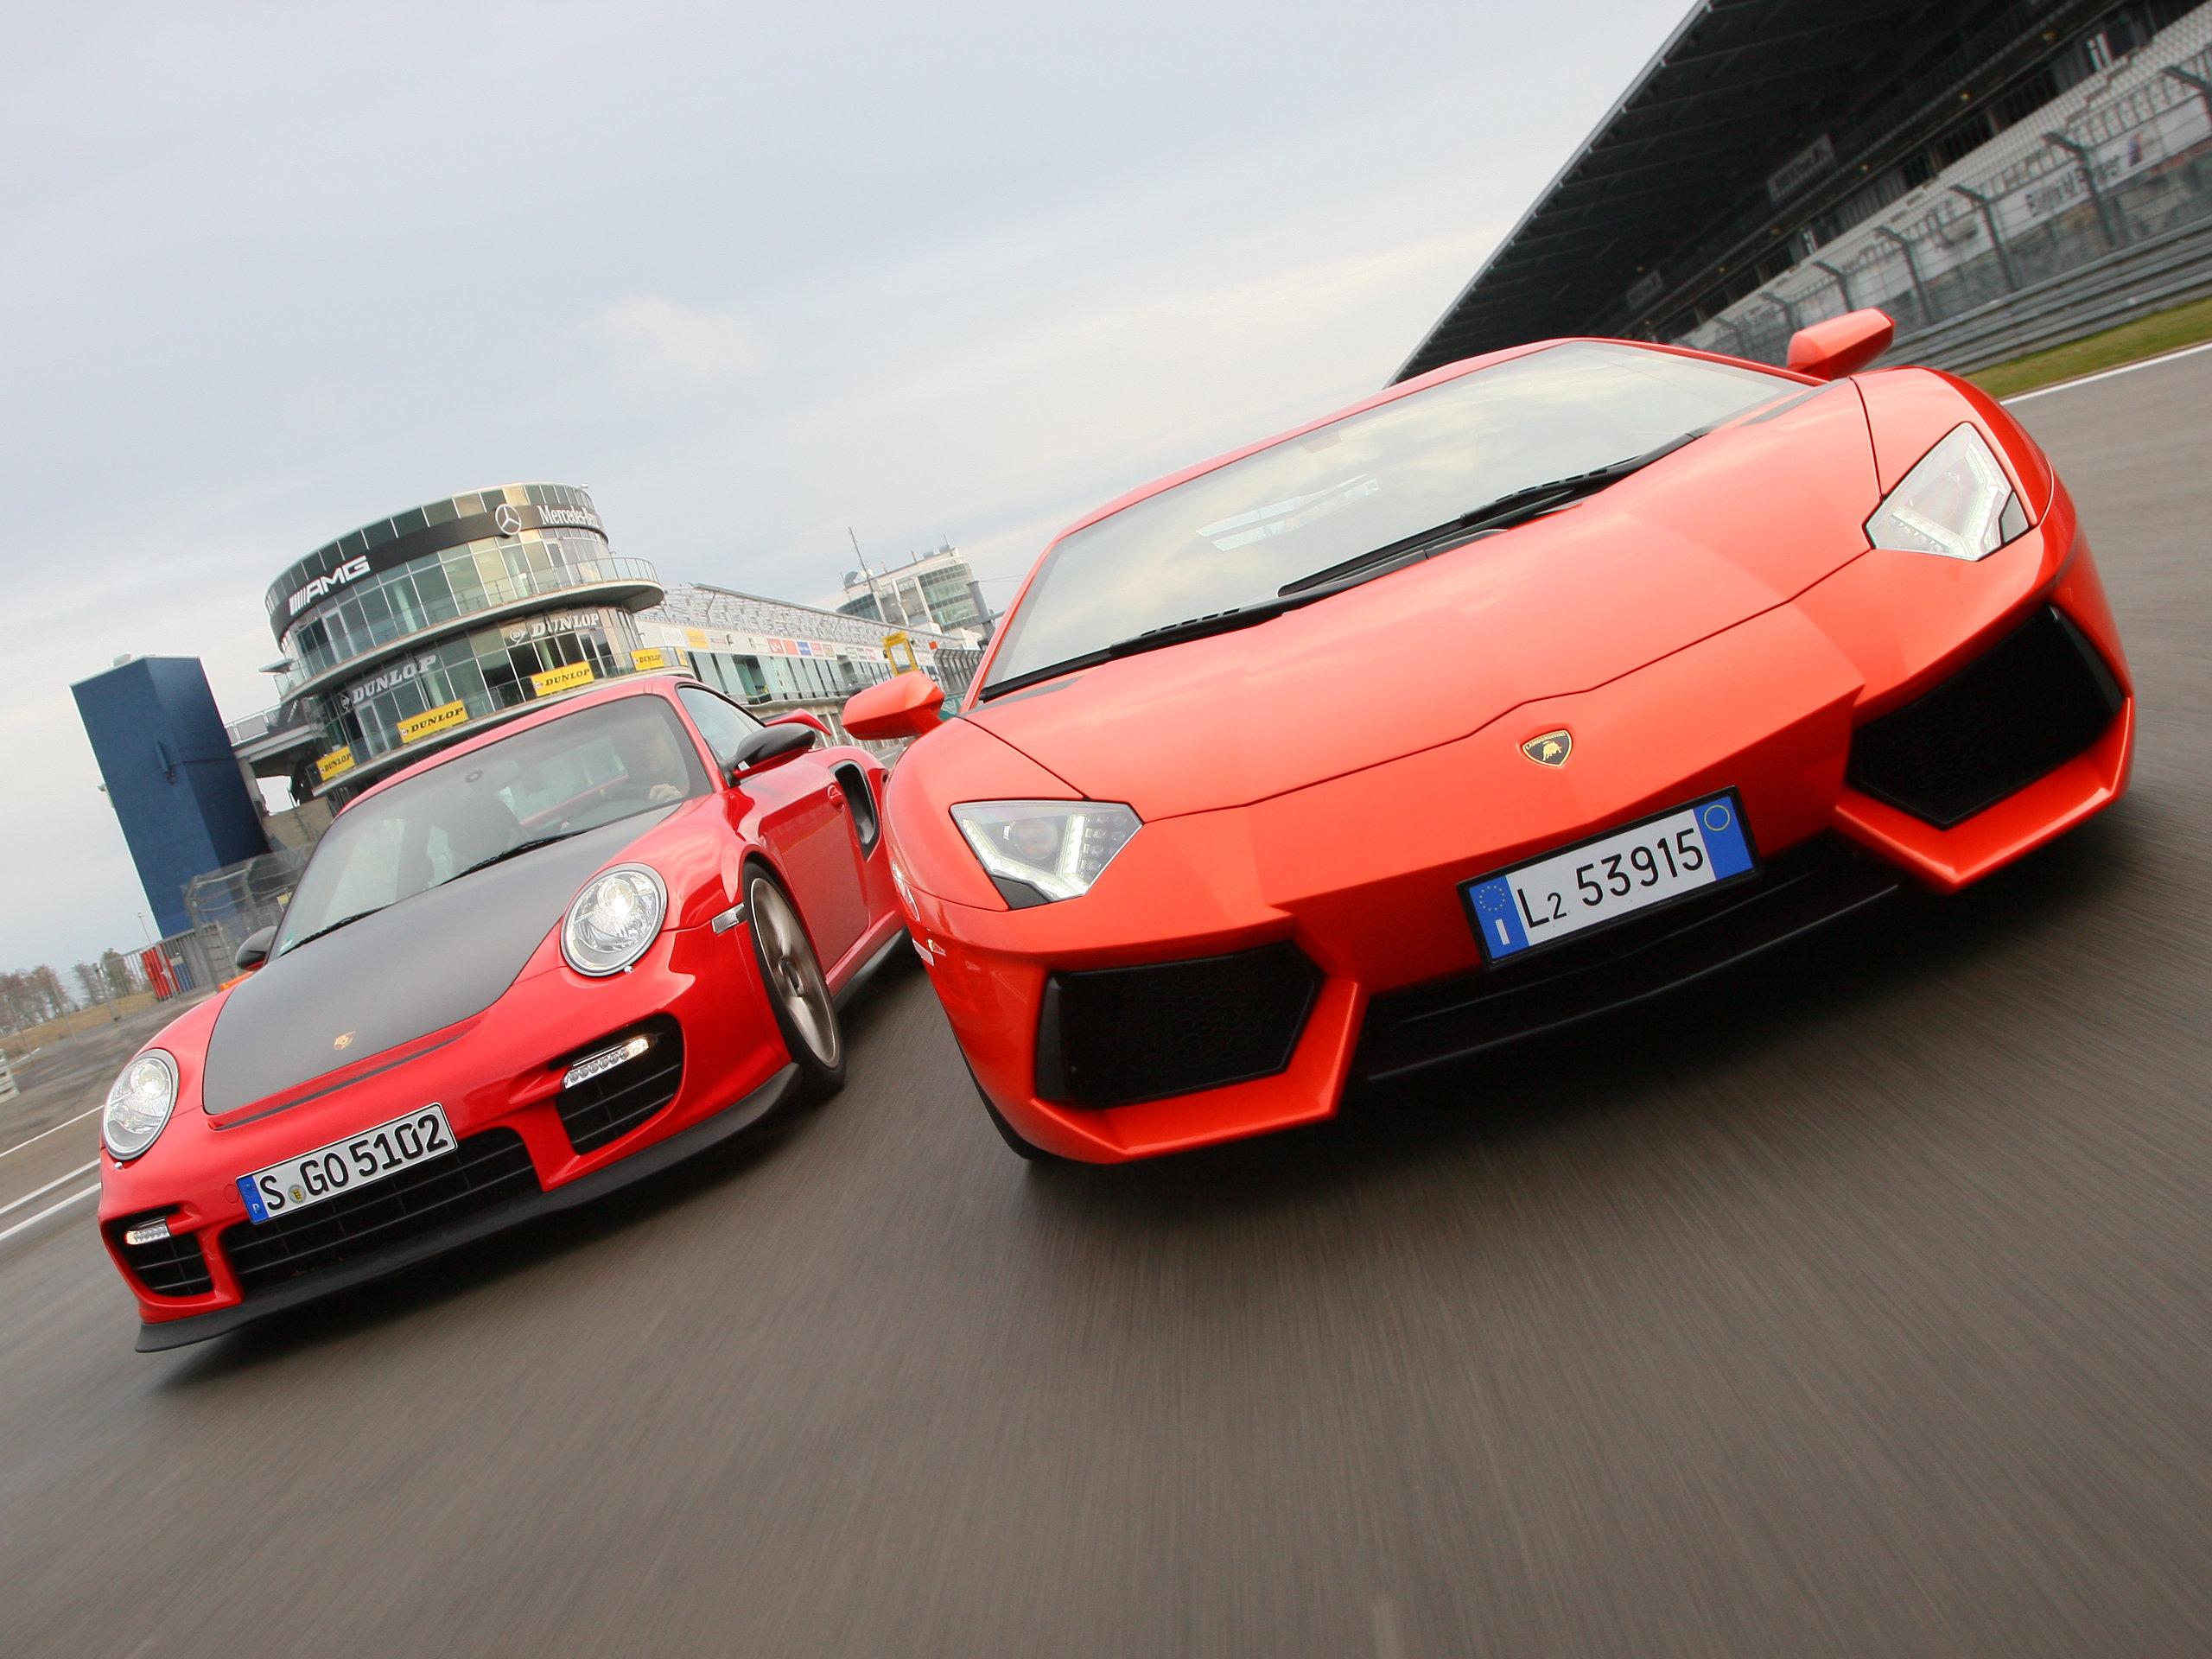 Bilder-Porsche-911-GT2-RS-Lamborghini-Aventador-LP-700-4-Vergleich-2012-004 Stunning Porsche 911 Gt2 Rs Vs Lamborghini Aventador Cars Trend